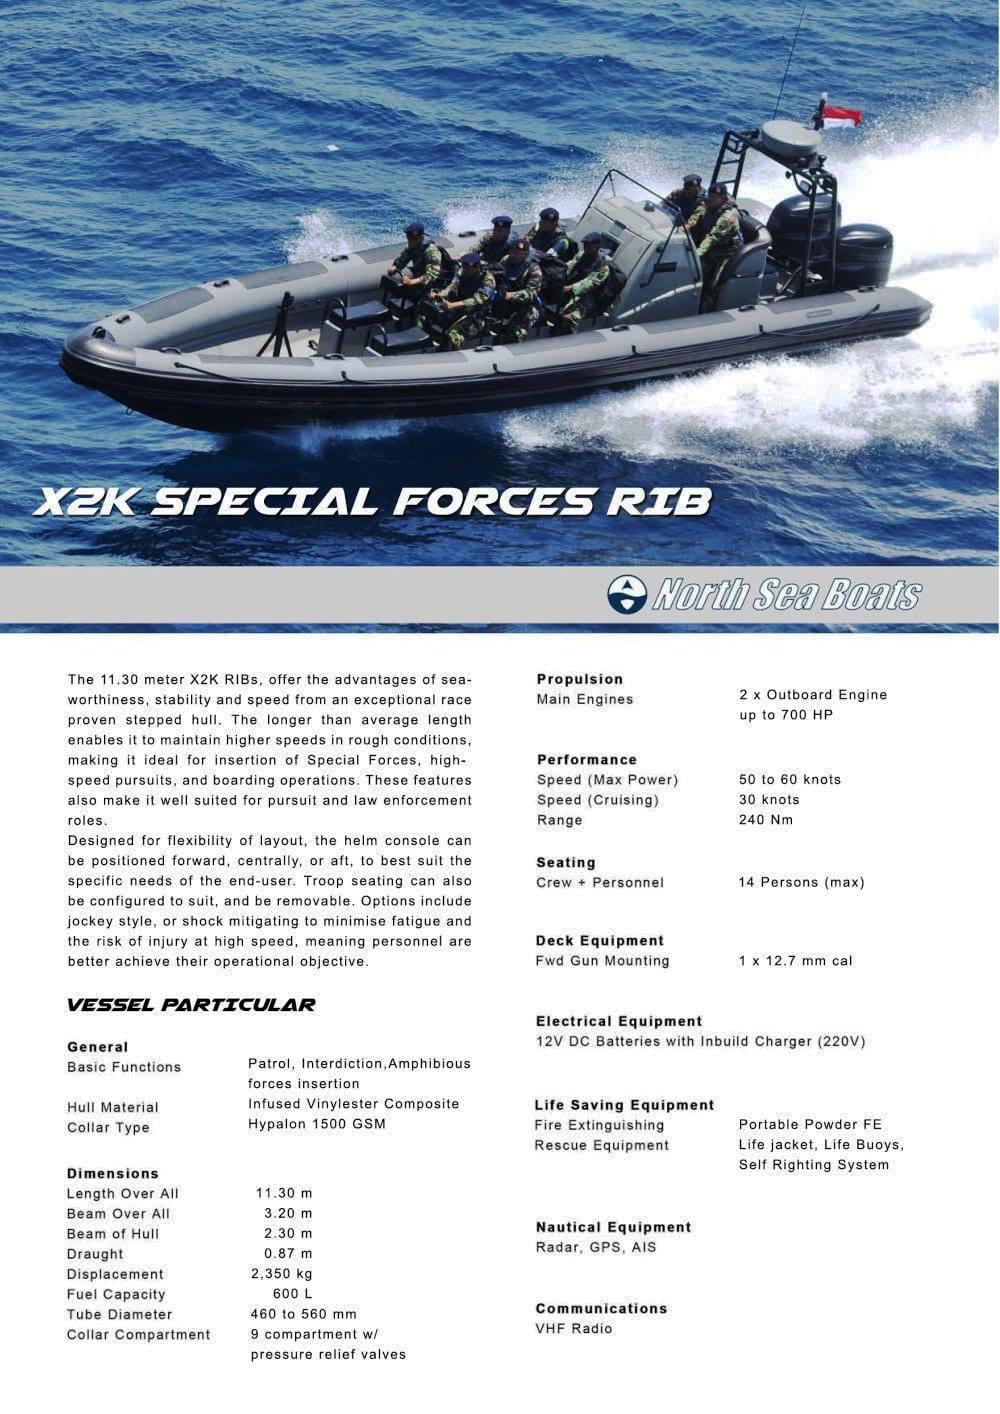 x2k-special-forces-rib-89654_1b